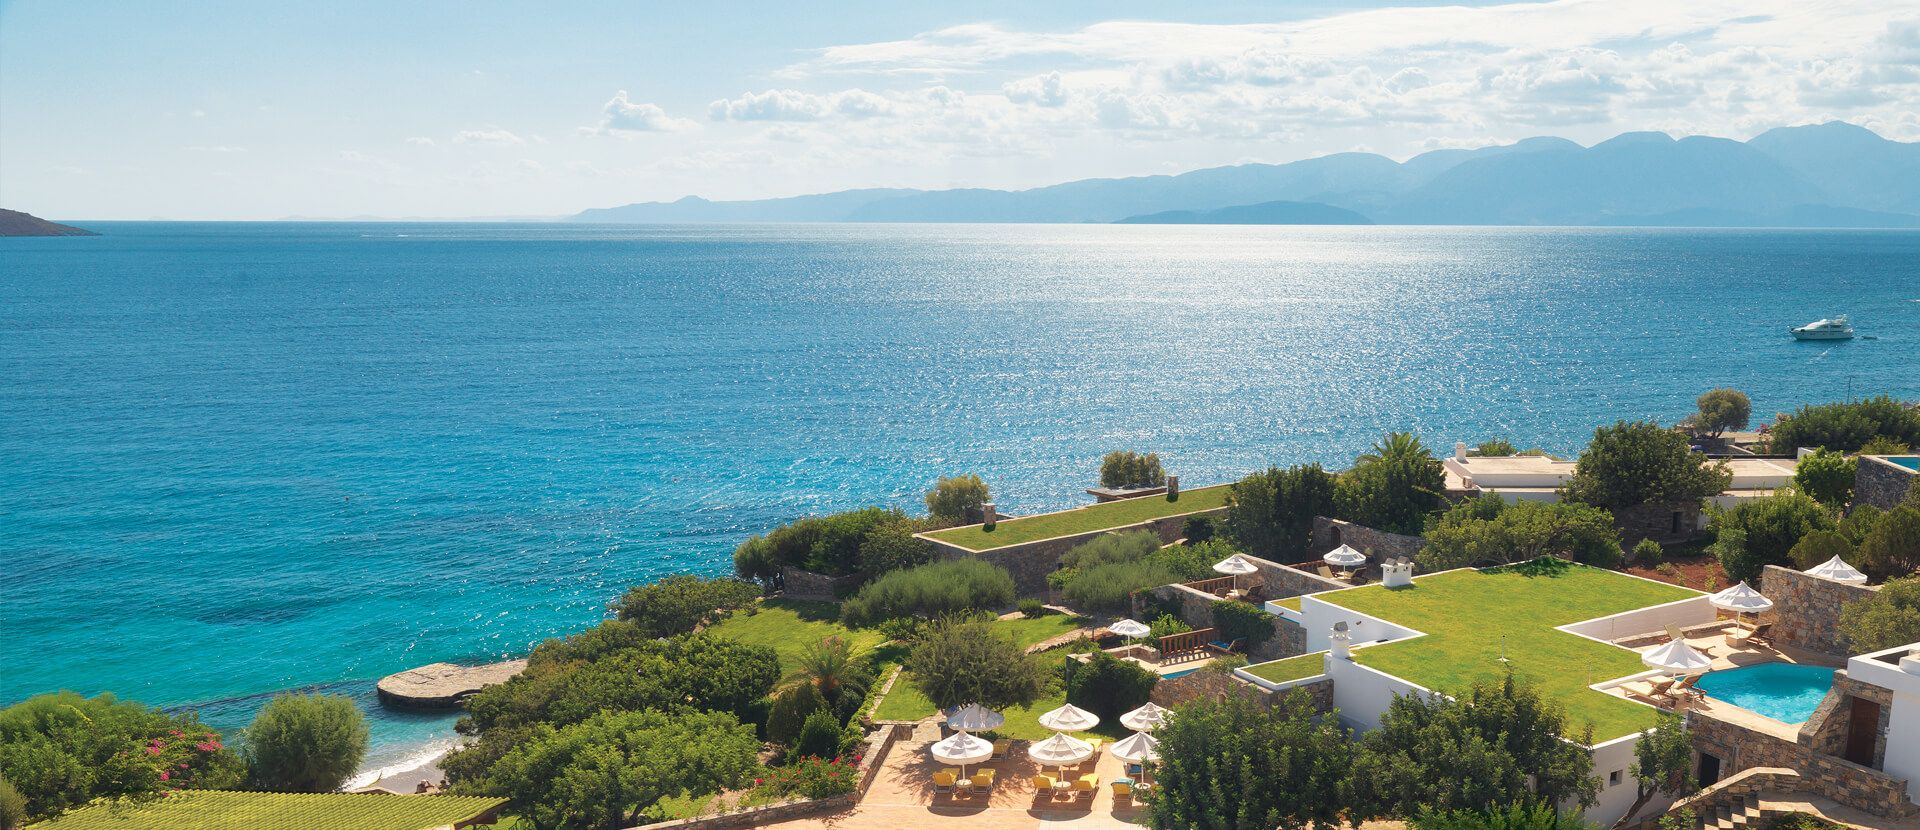 Elounda Mare Hotel Relais & Chateaux